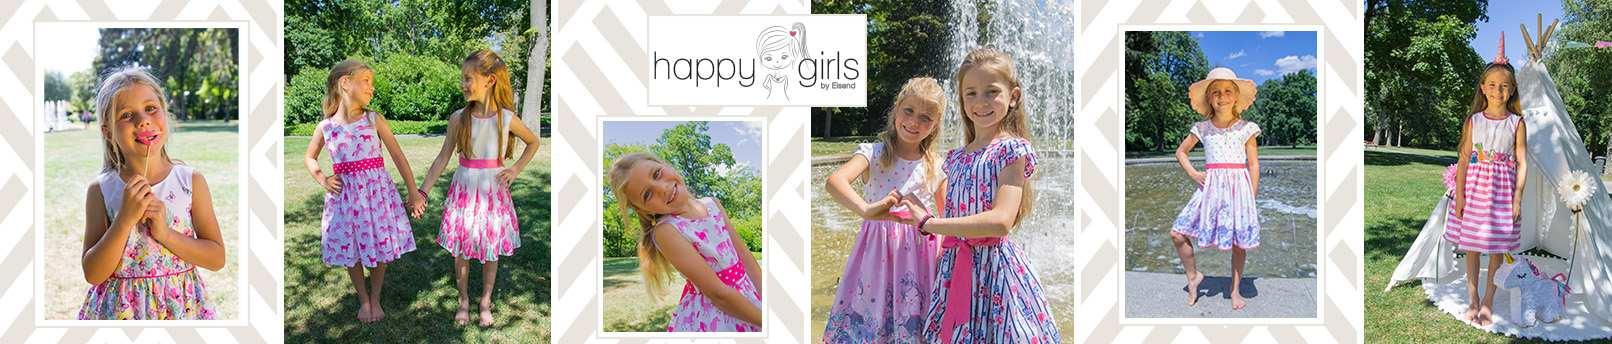 happy girls shoppen